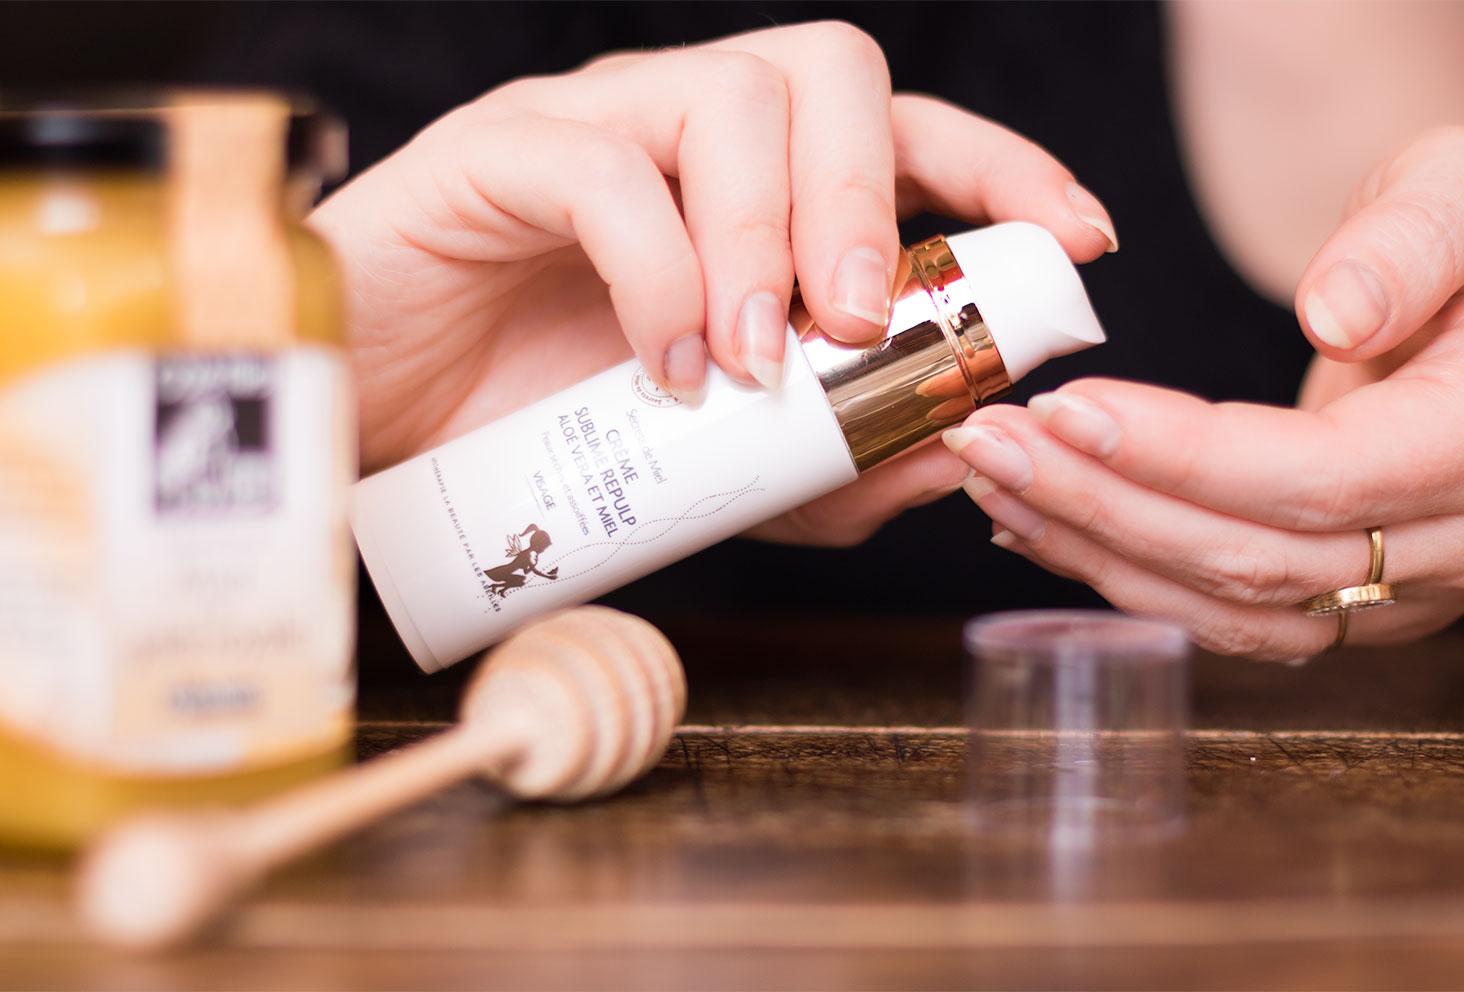 Utilisation de la crème Sublime Repulp de la marque Secrets de Miel